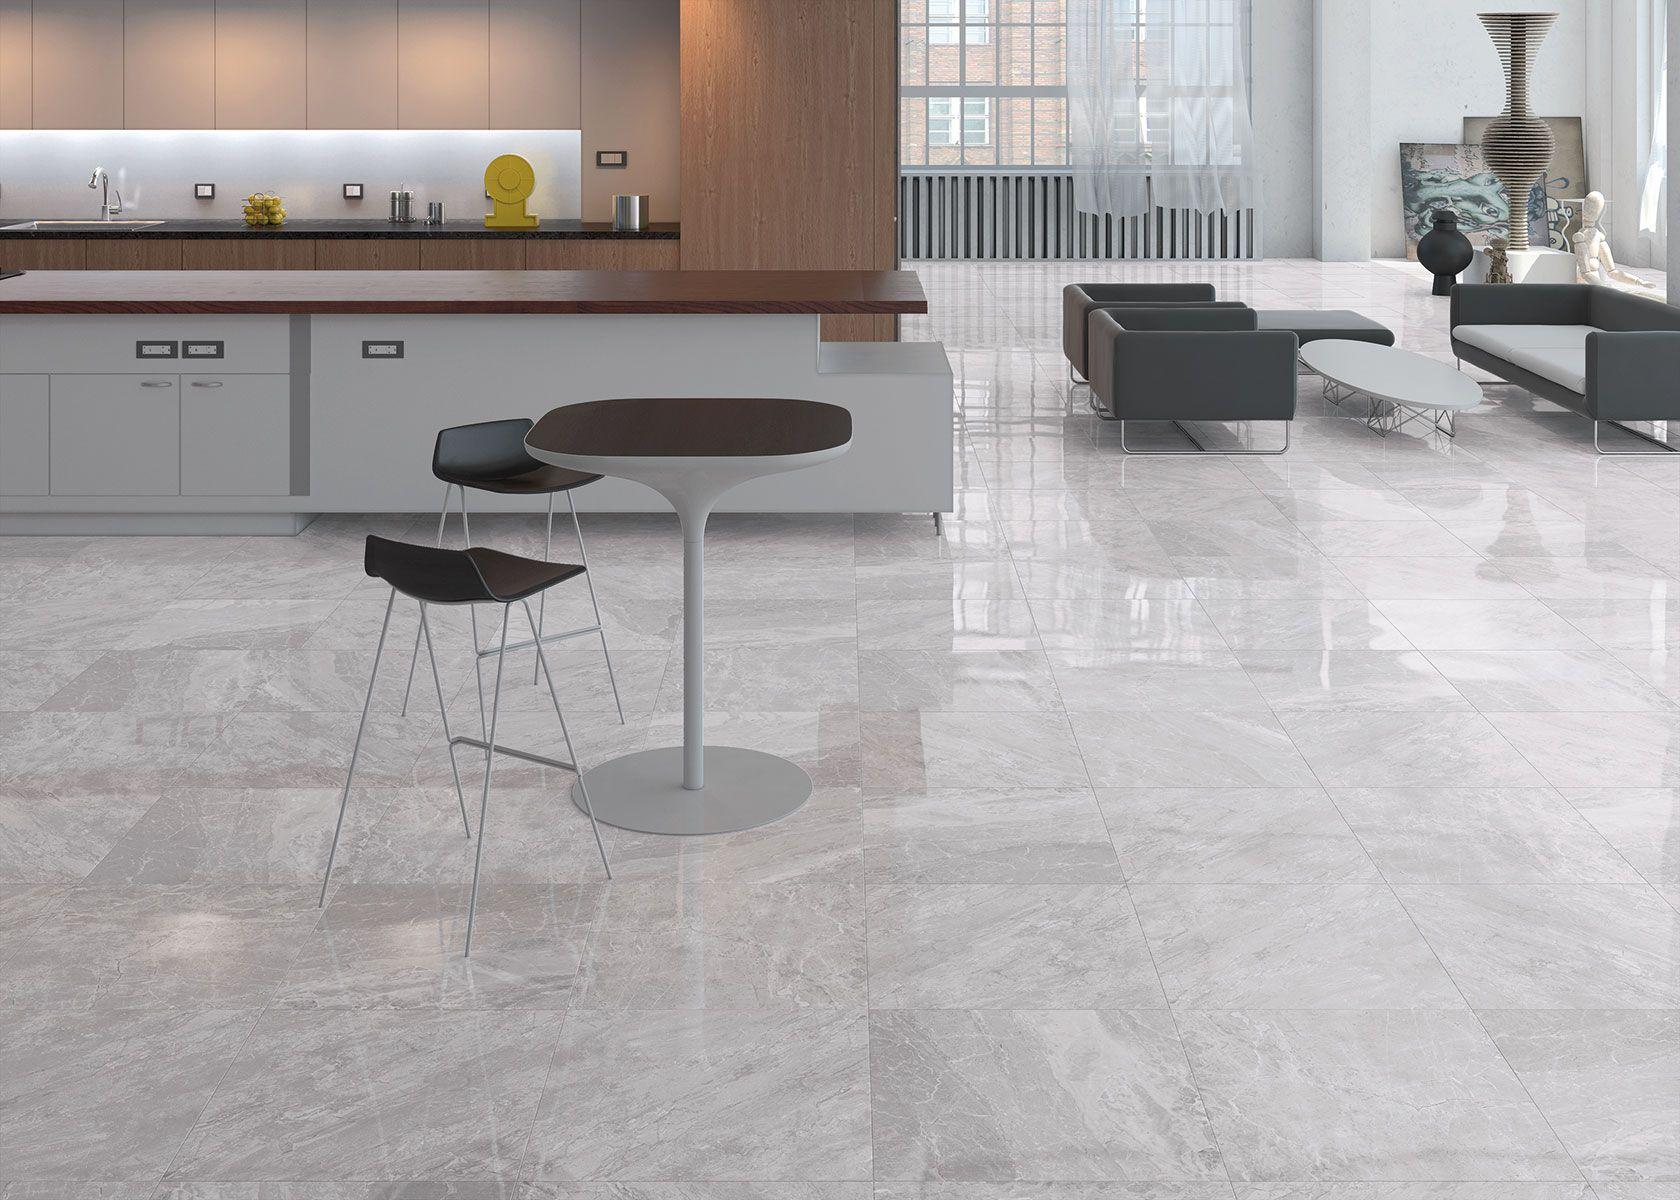 Prestige natural 60x60 serie prestige porcel nico for Como limpiar marmol blanco manchado